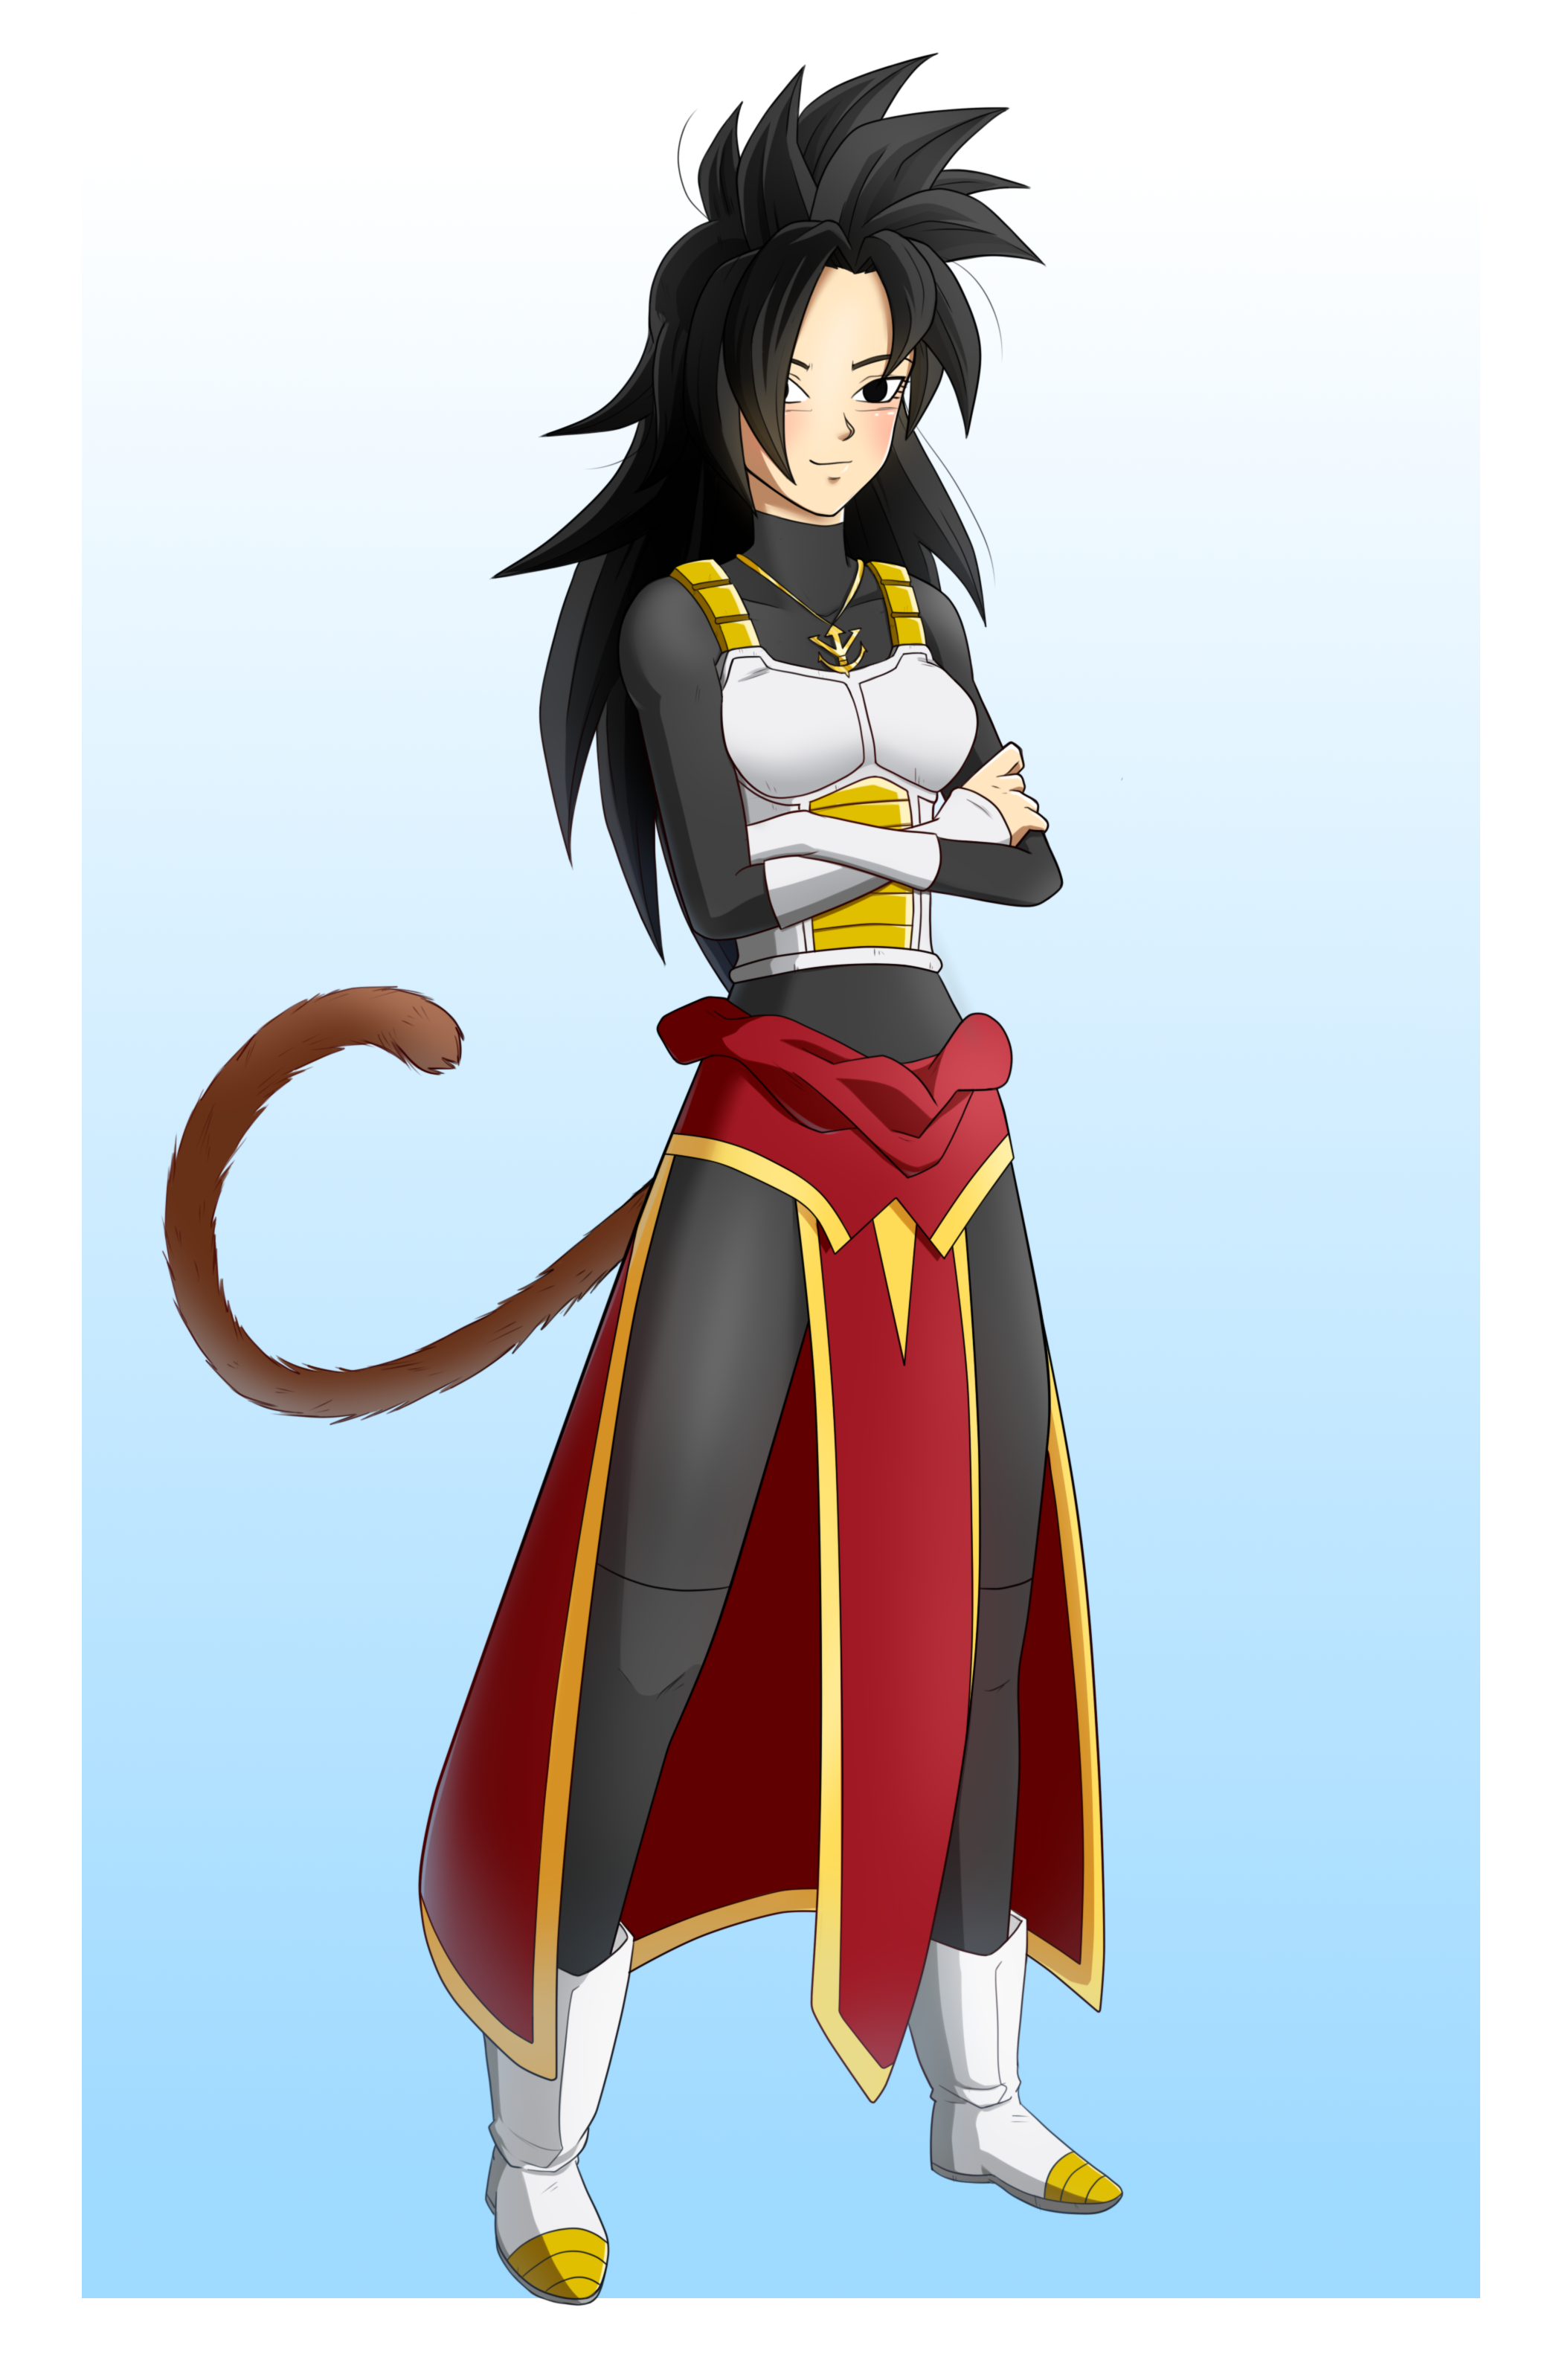 6 Commission Fullbody Full Color Female Character Named Mirlitha For Viathan1994 Dragon Ball Super Manga Anime Dragon Ball Super Female Dragon